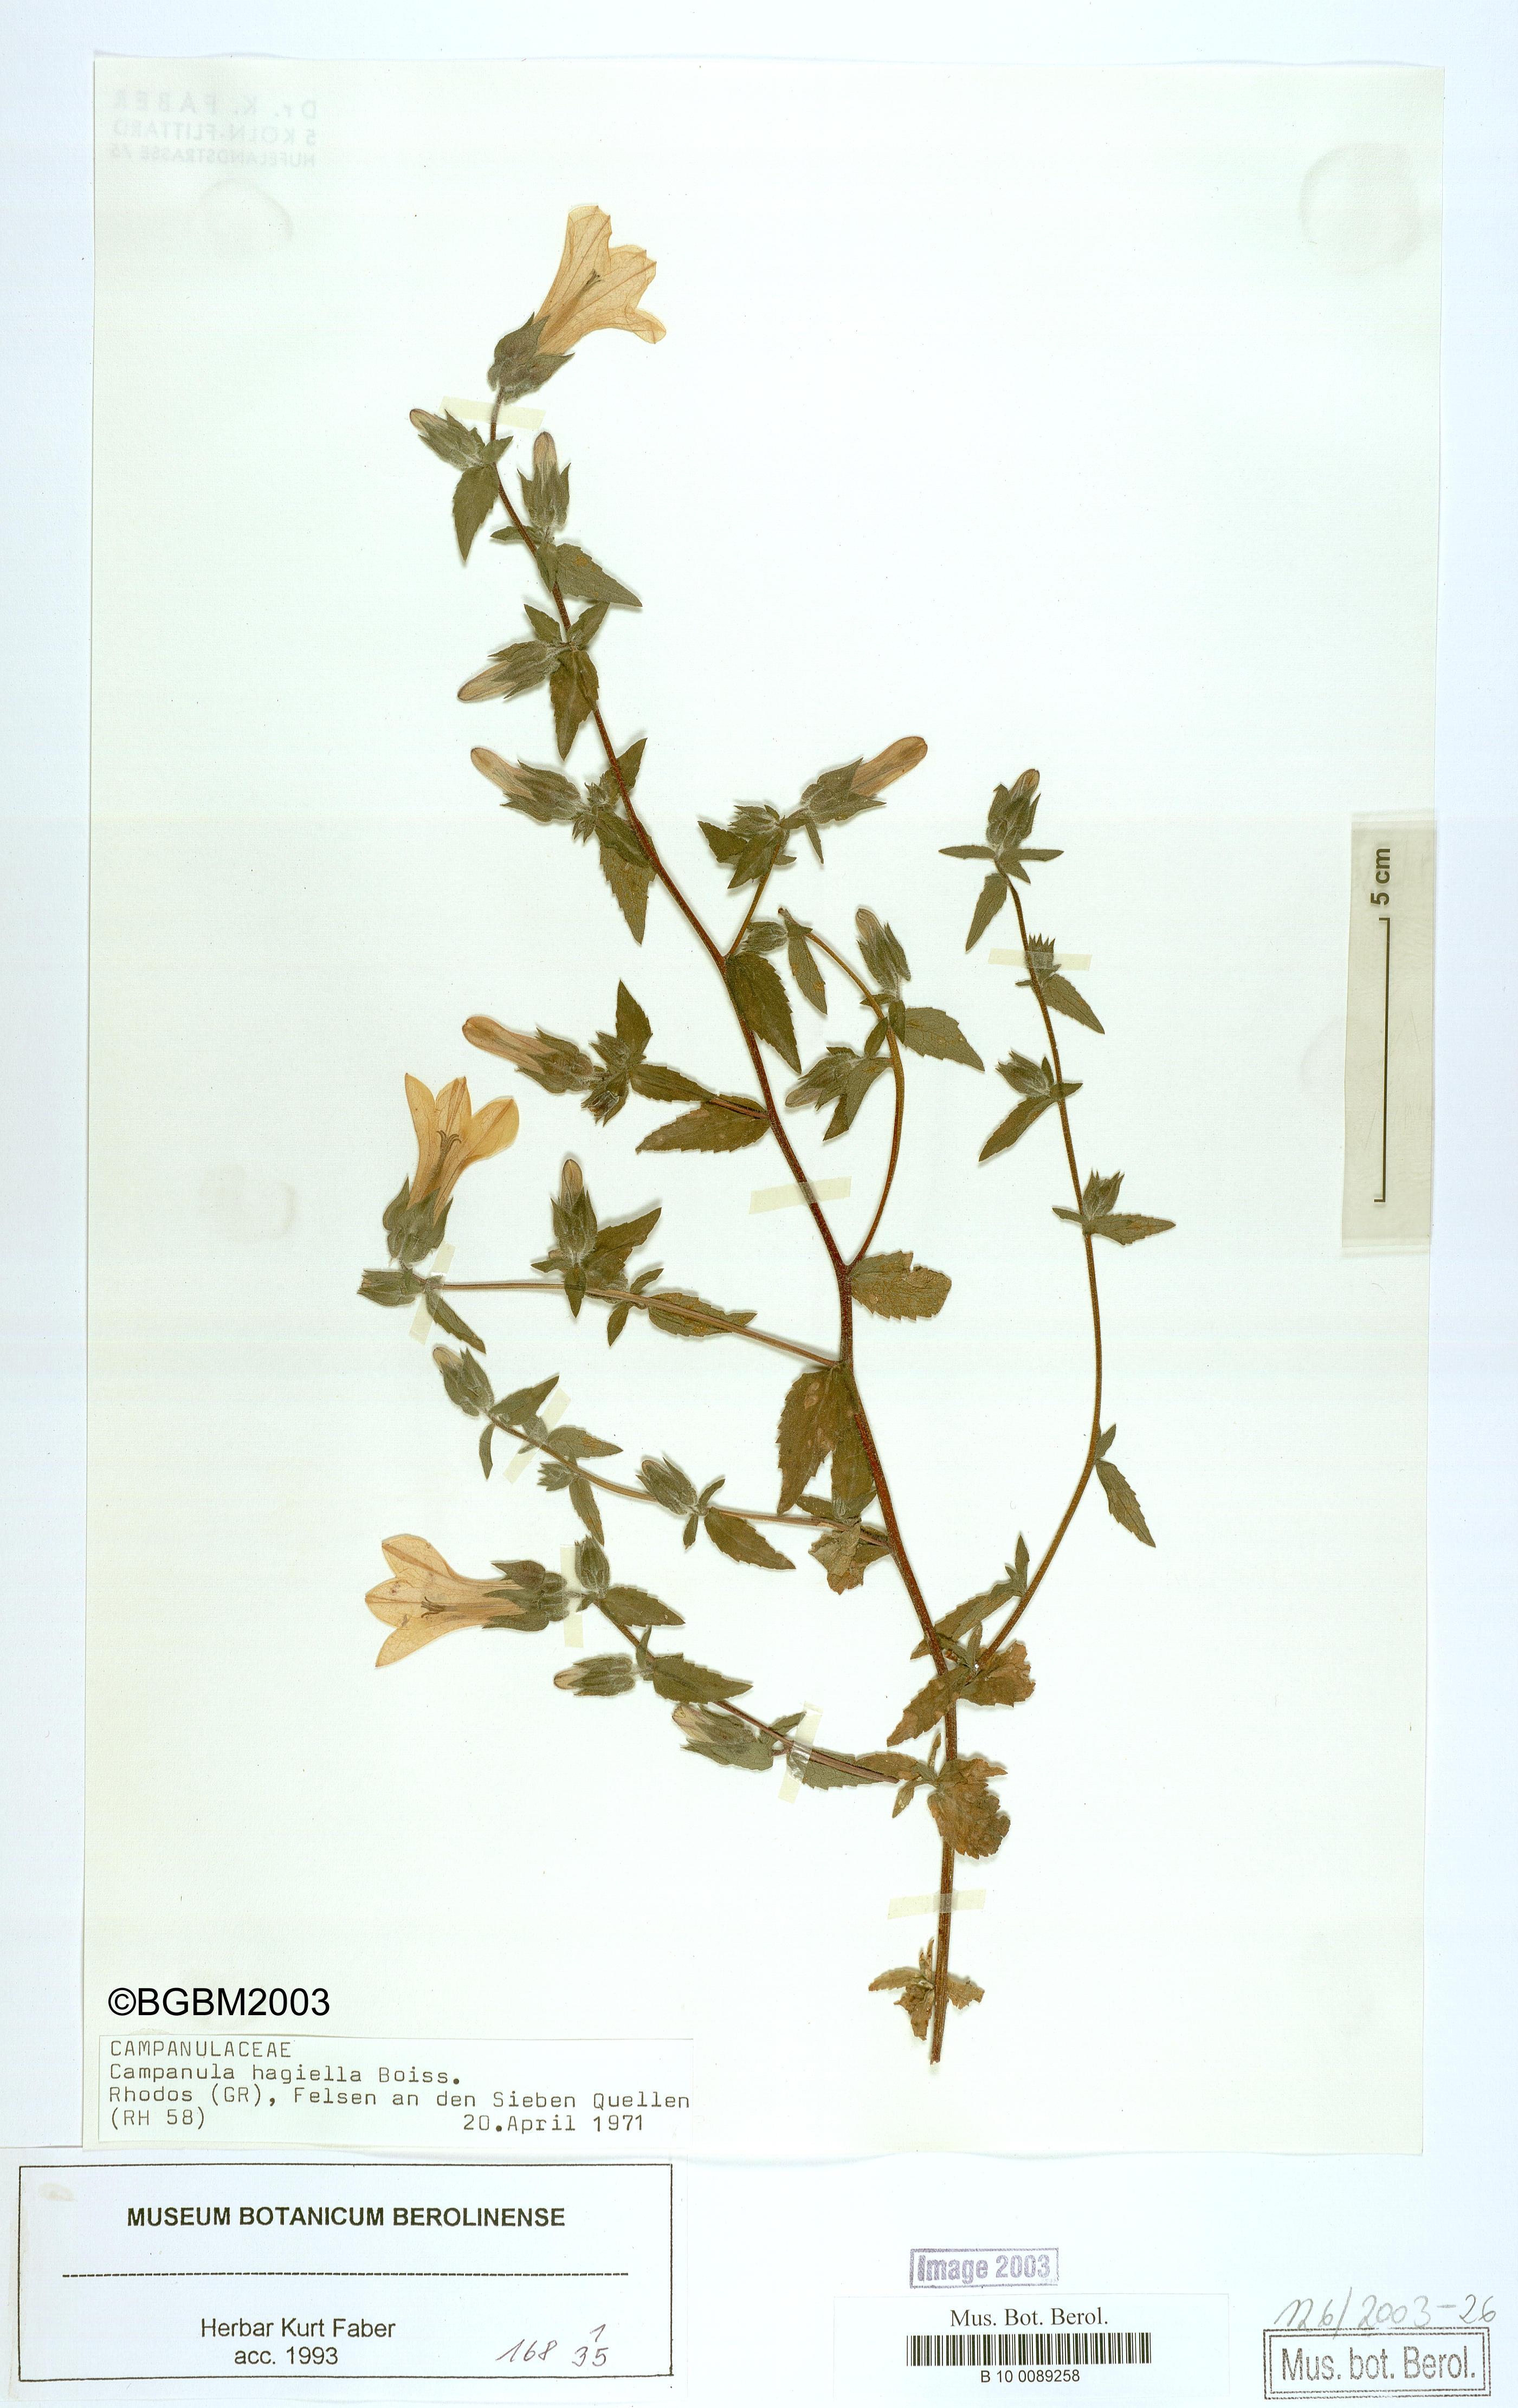 http://ww2.bgbm.org/herbarium/images/B/10/00/89/25/B_10_0089258.jpg